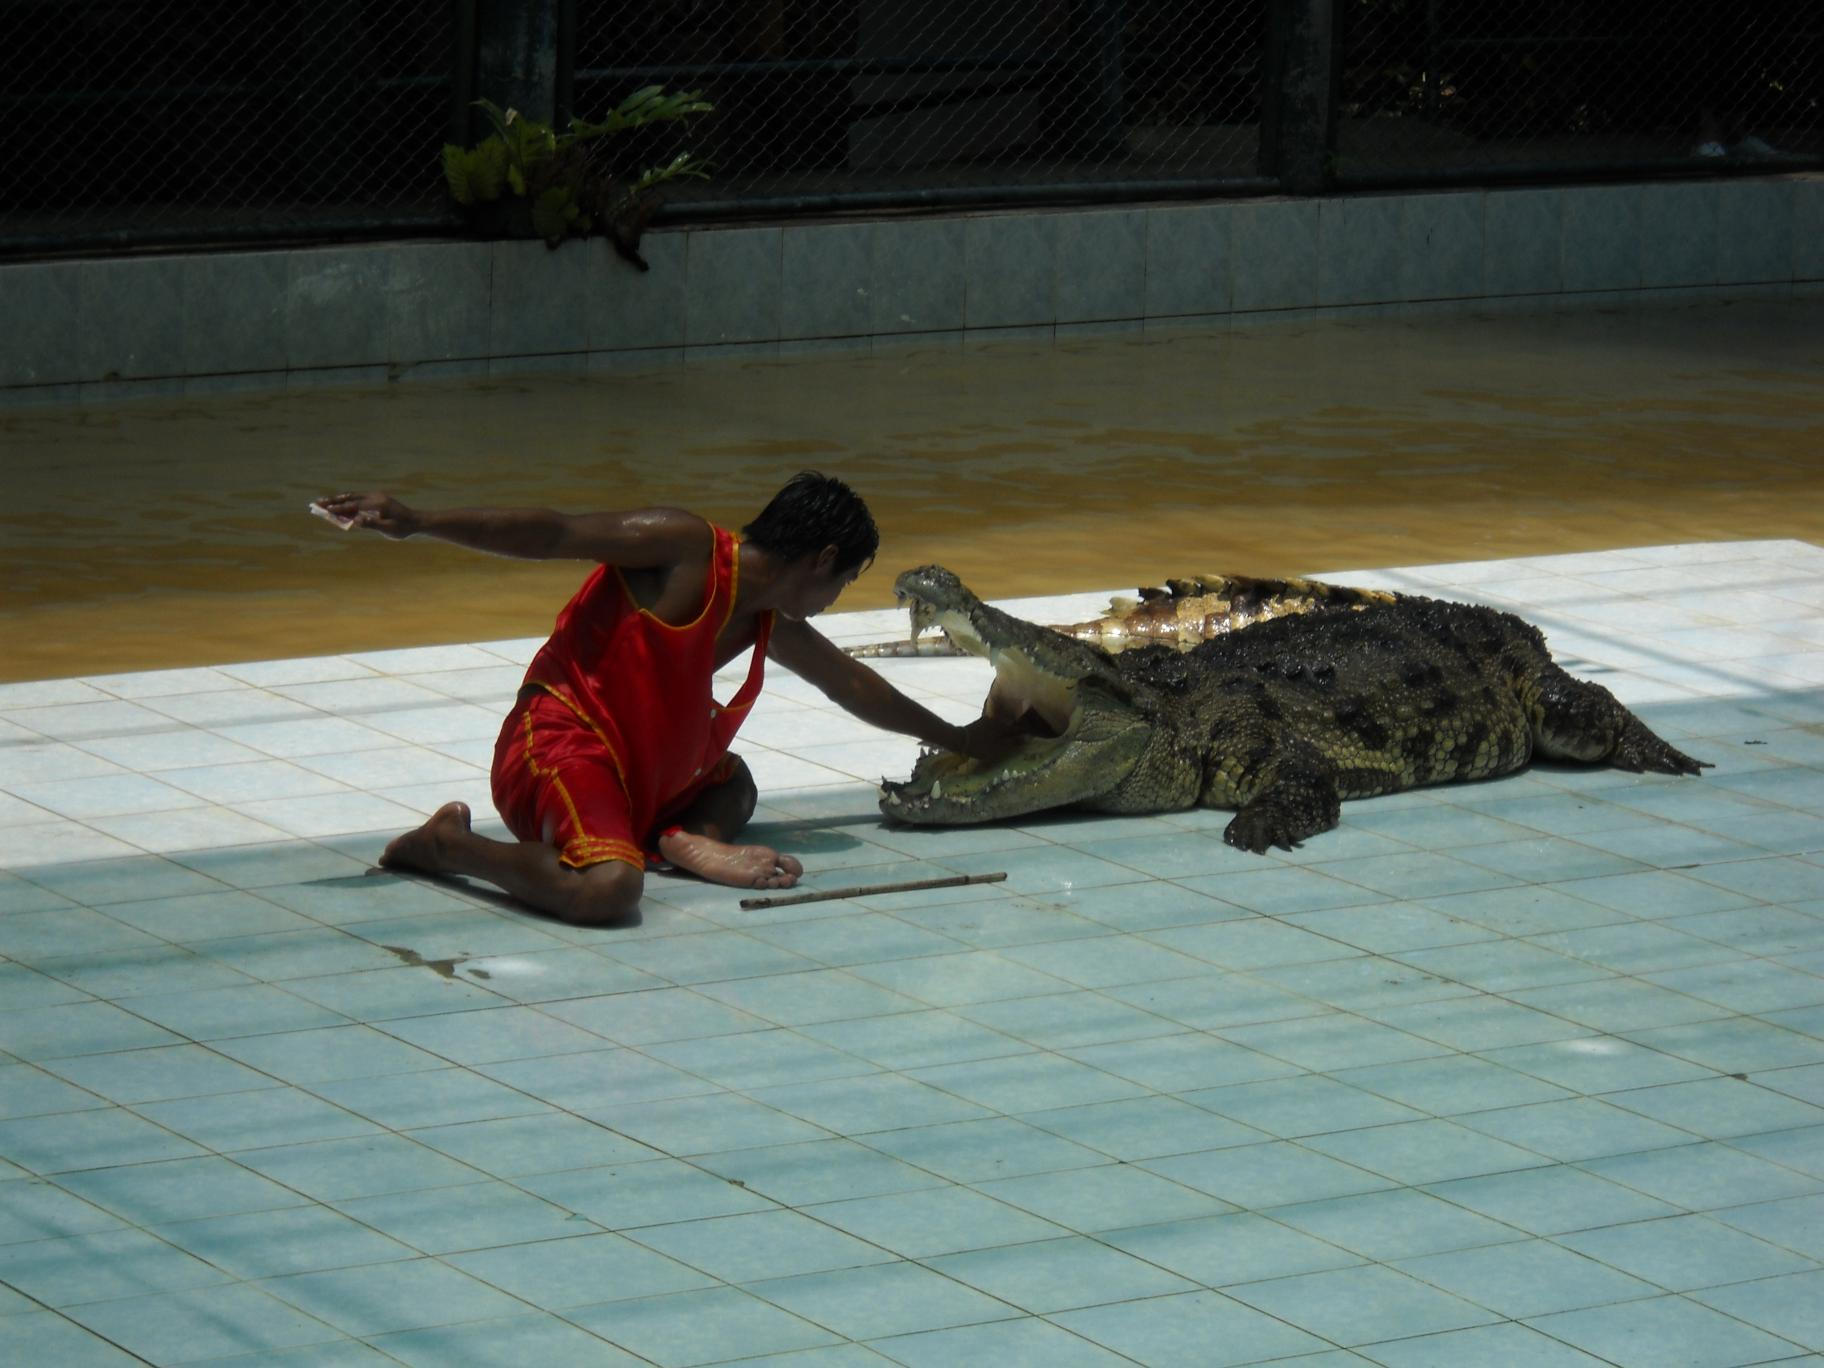 Как крокодилу гланды удаляли